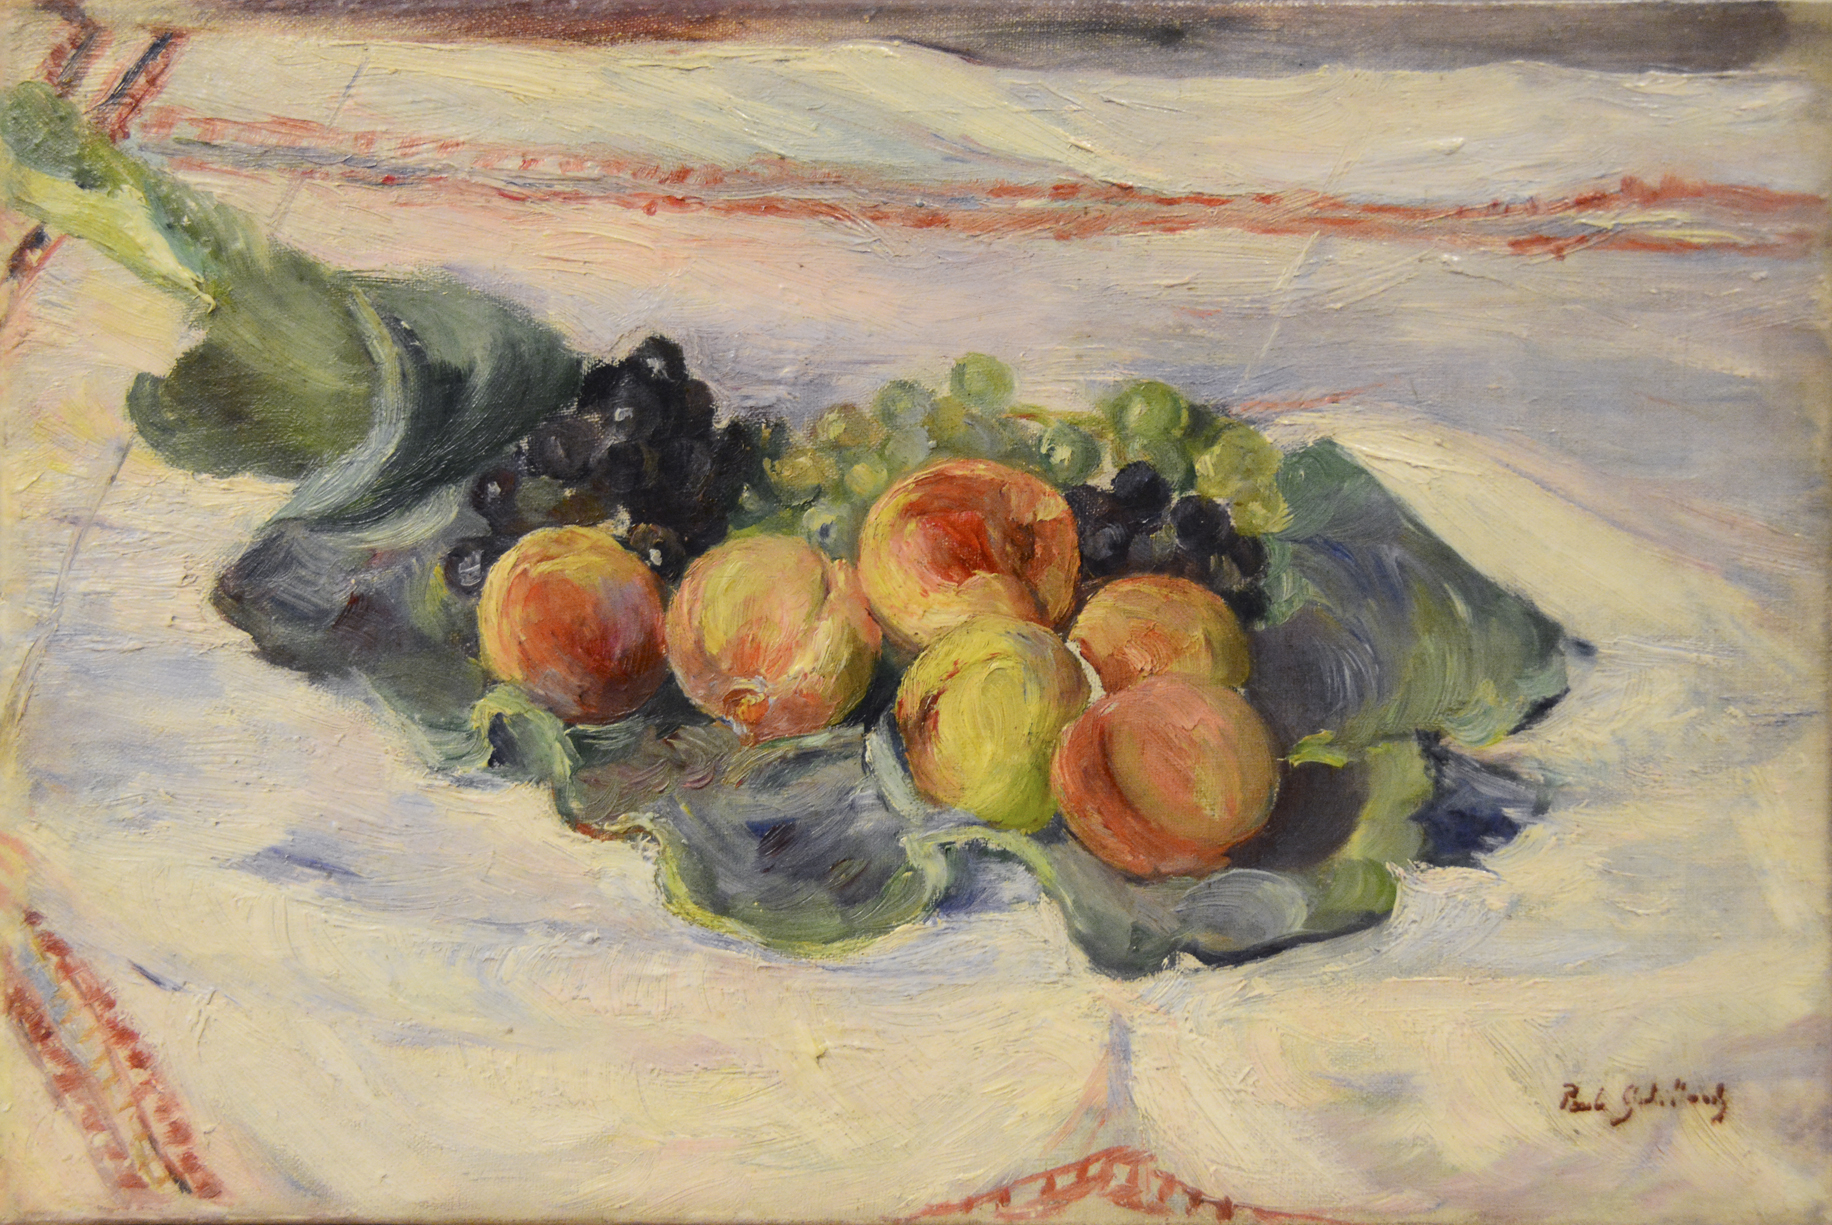 Nature morte aux pêches et au raisin (Still-life with Peaches and Grapes)